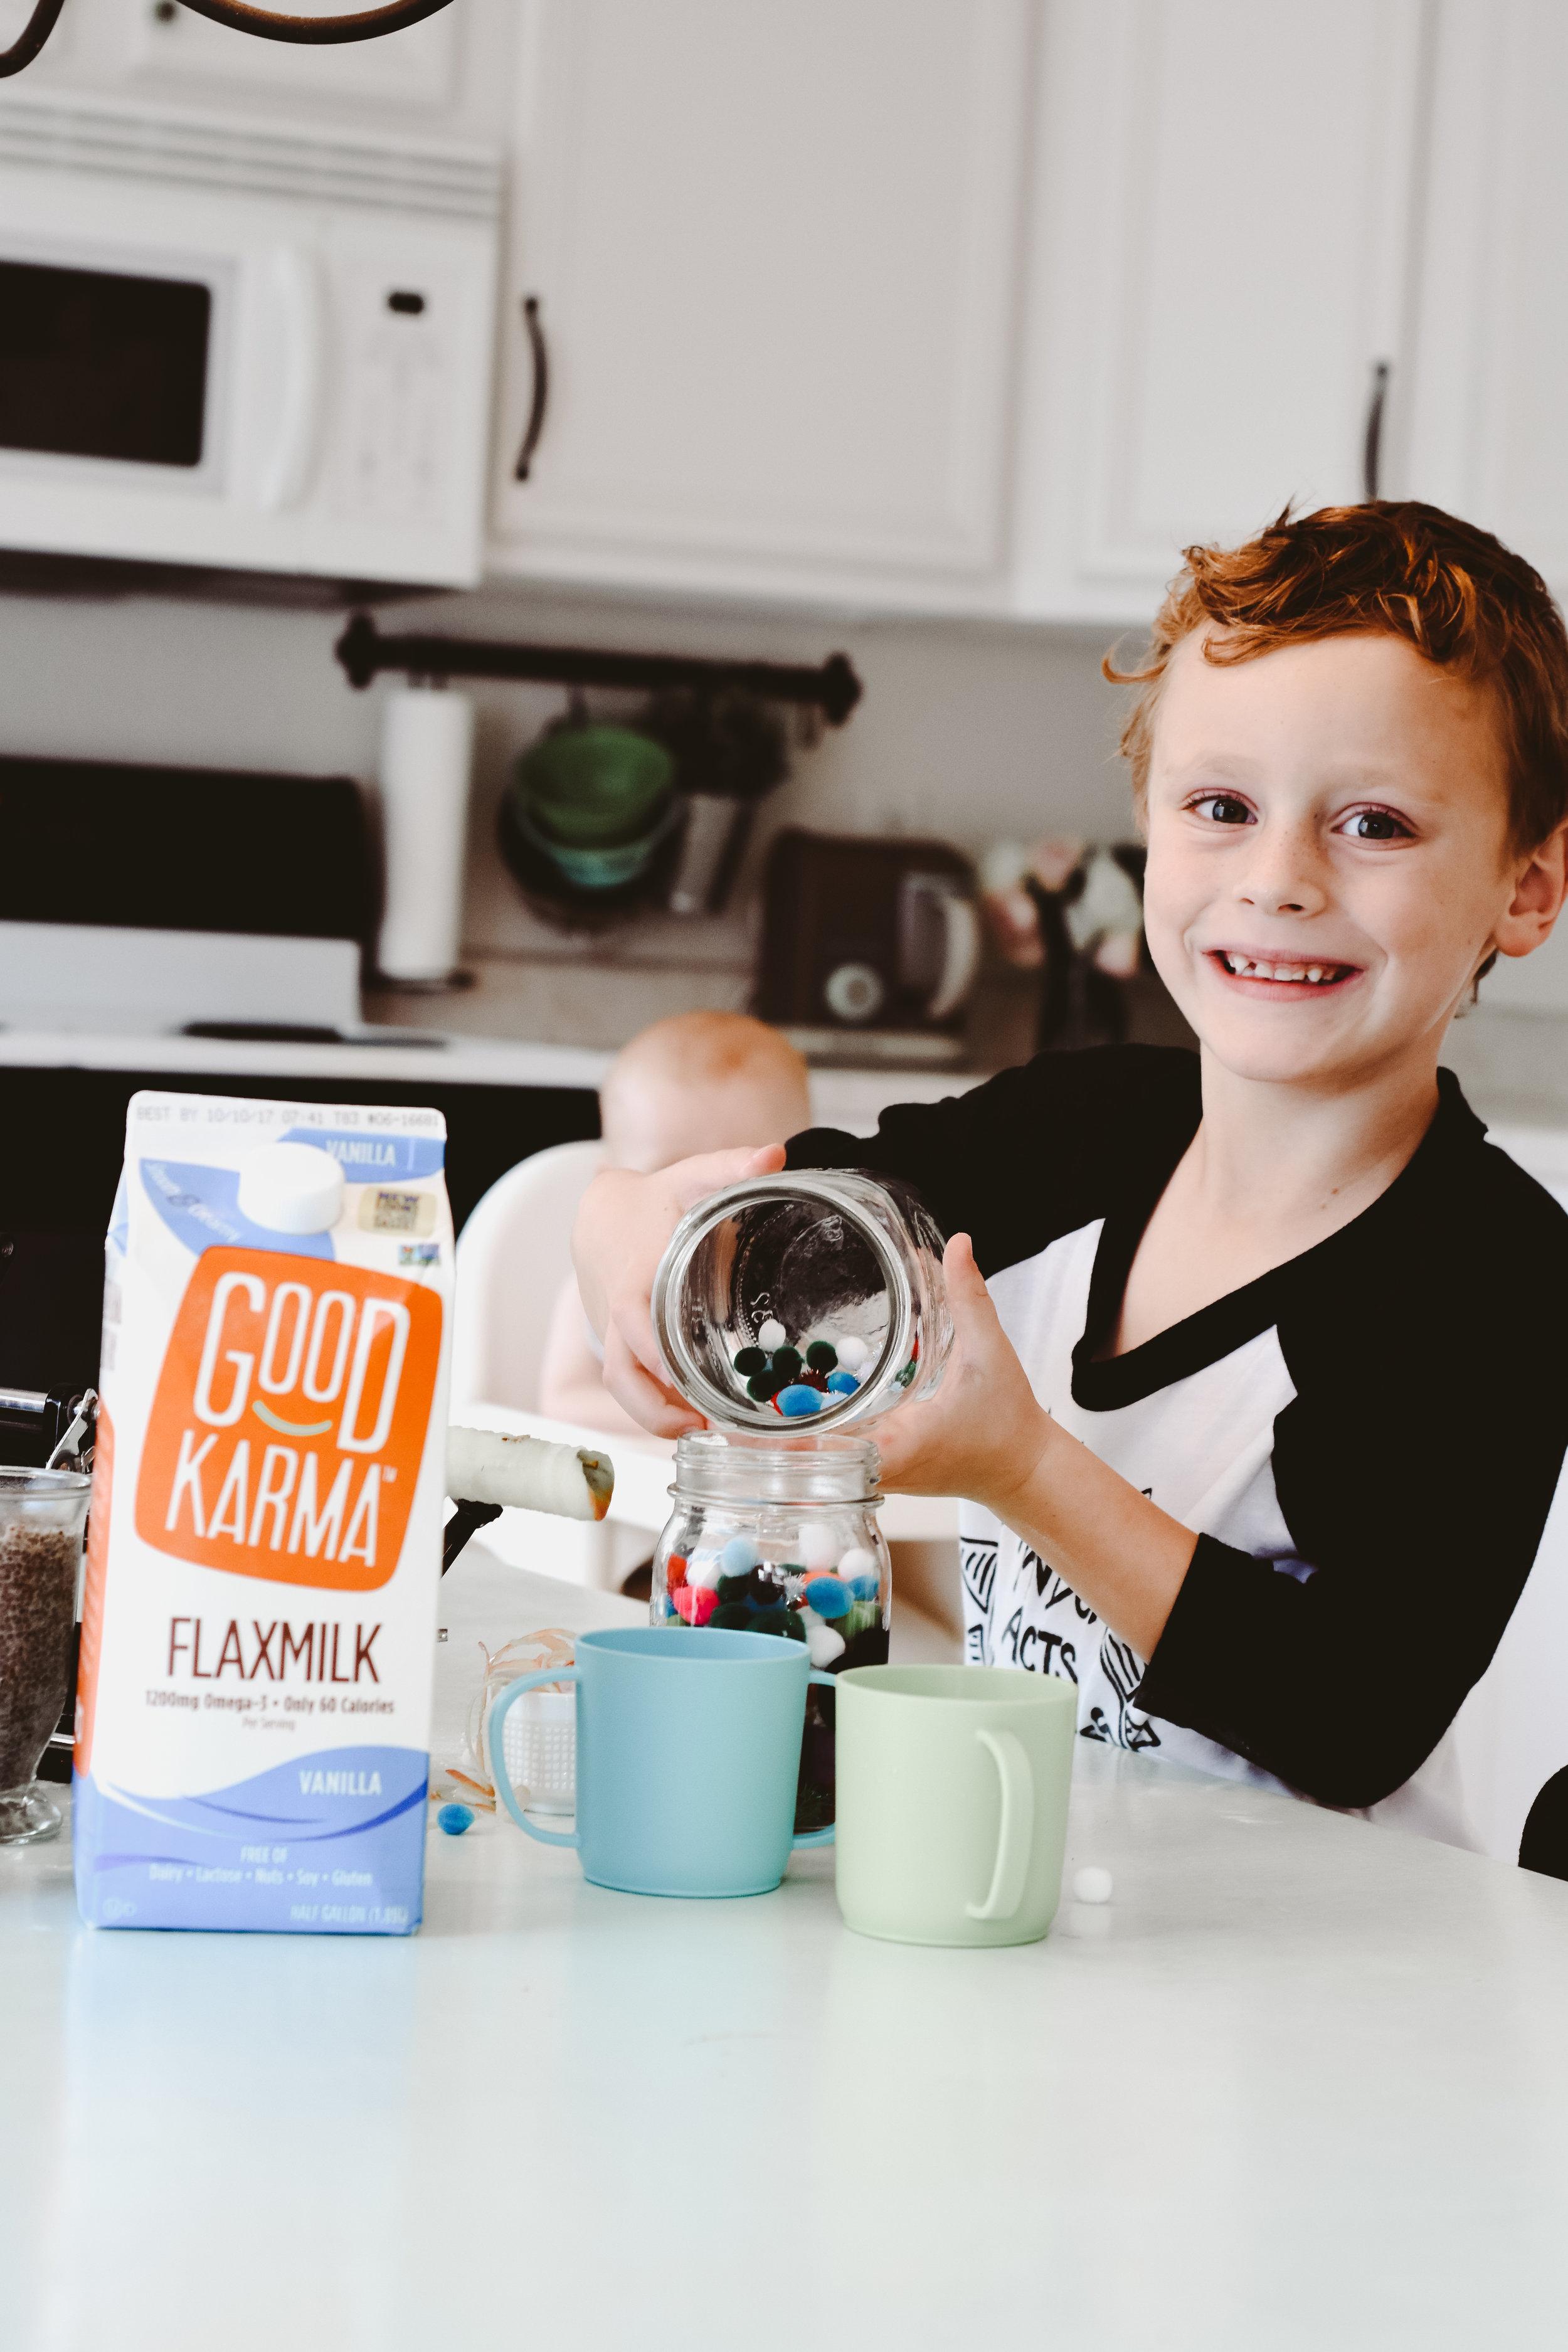 Dairy Free flaxmilk